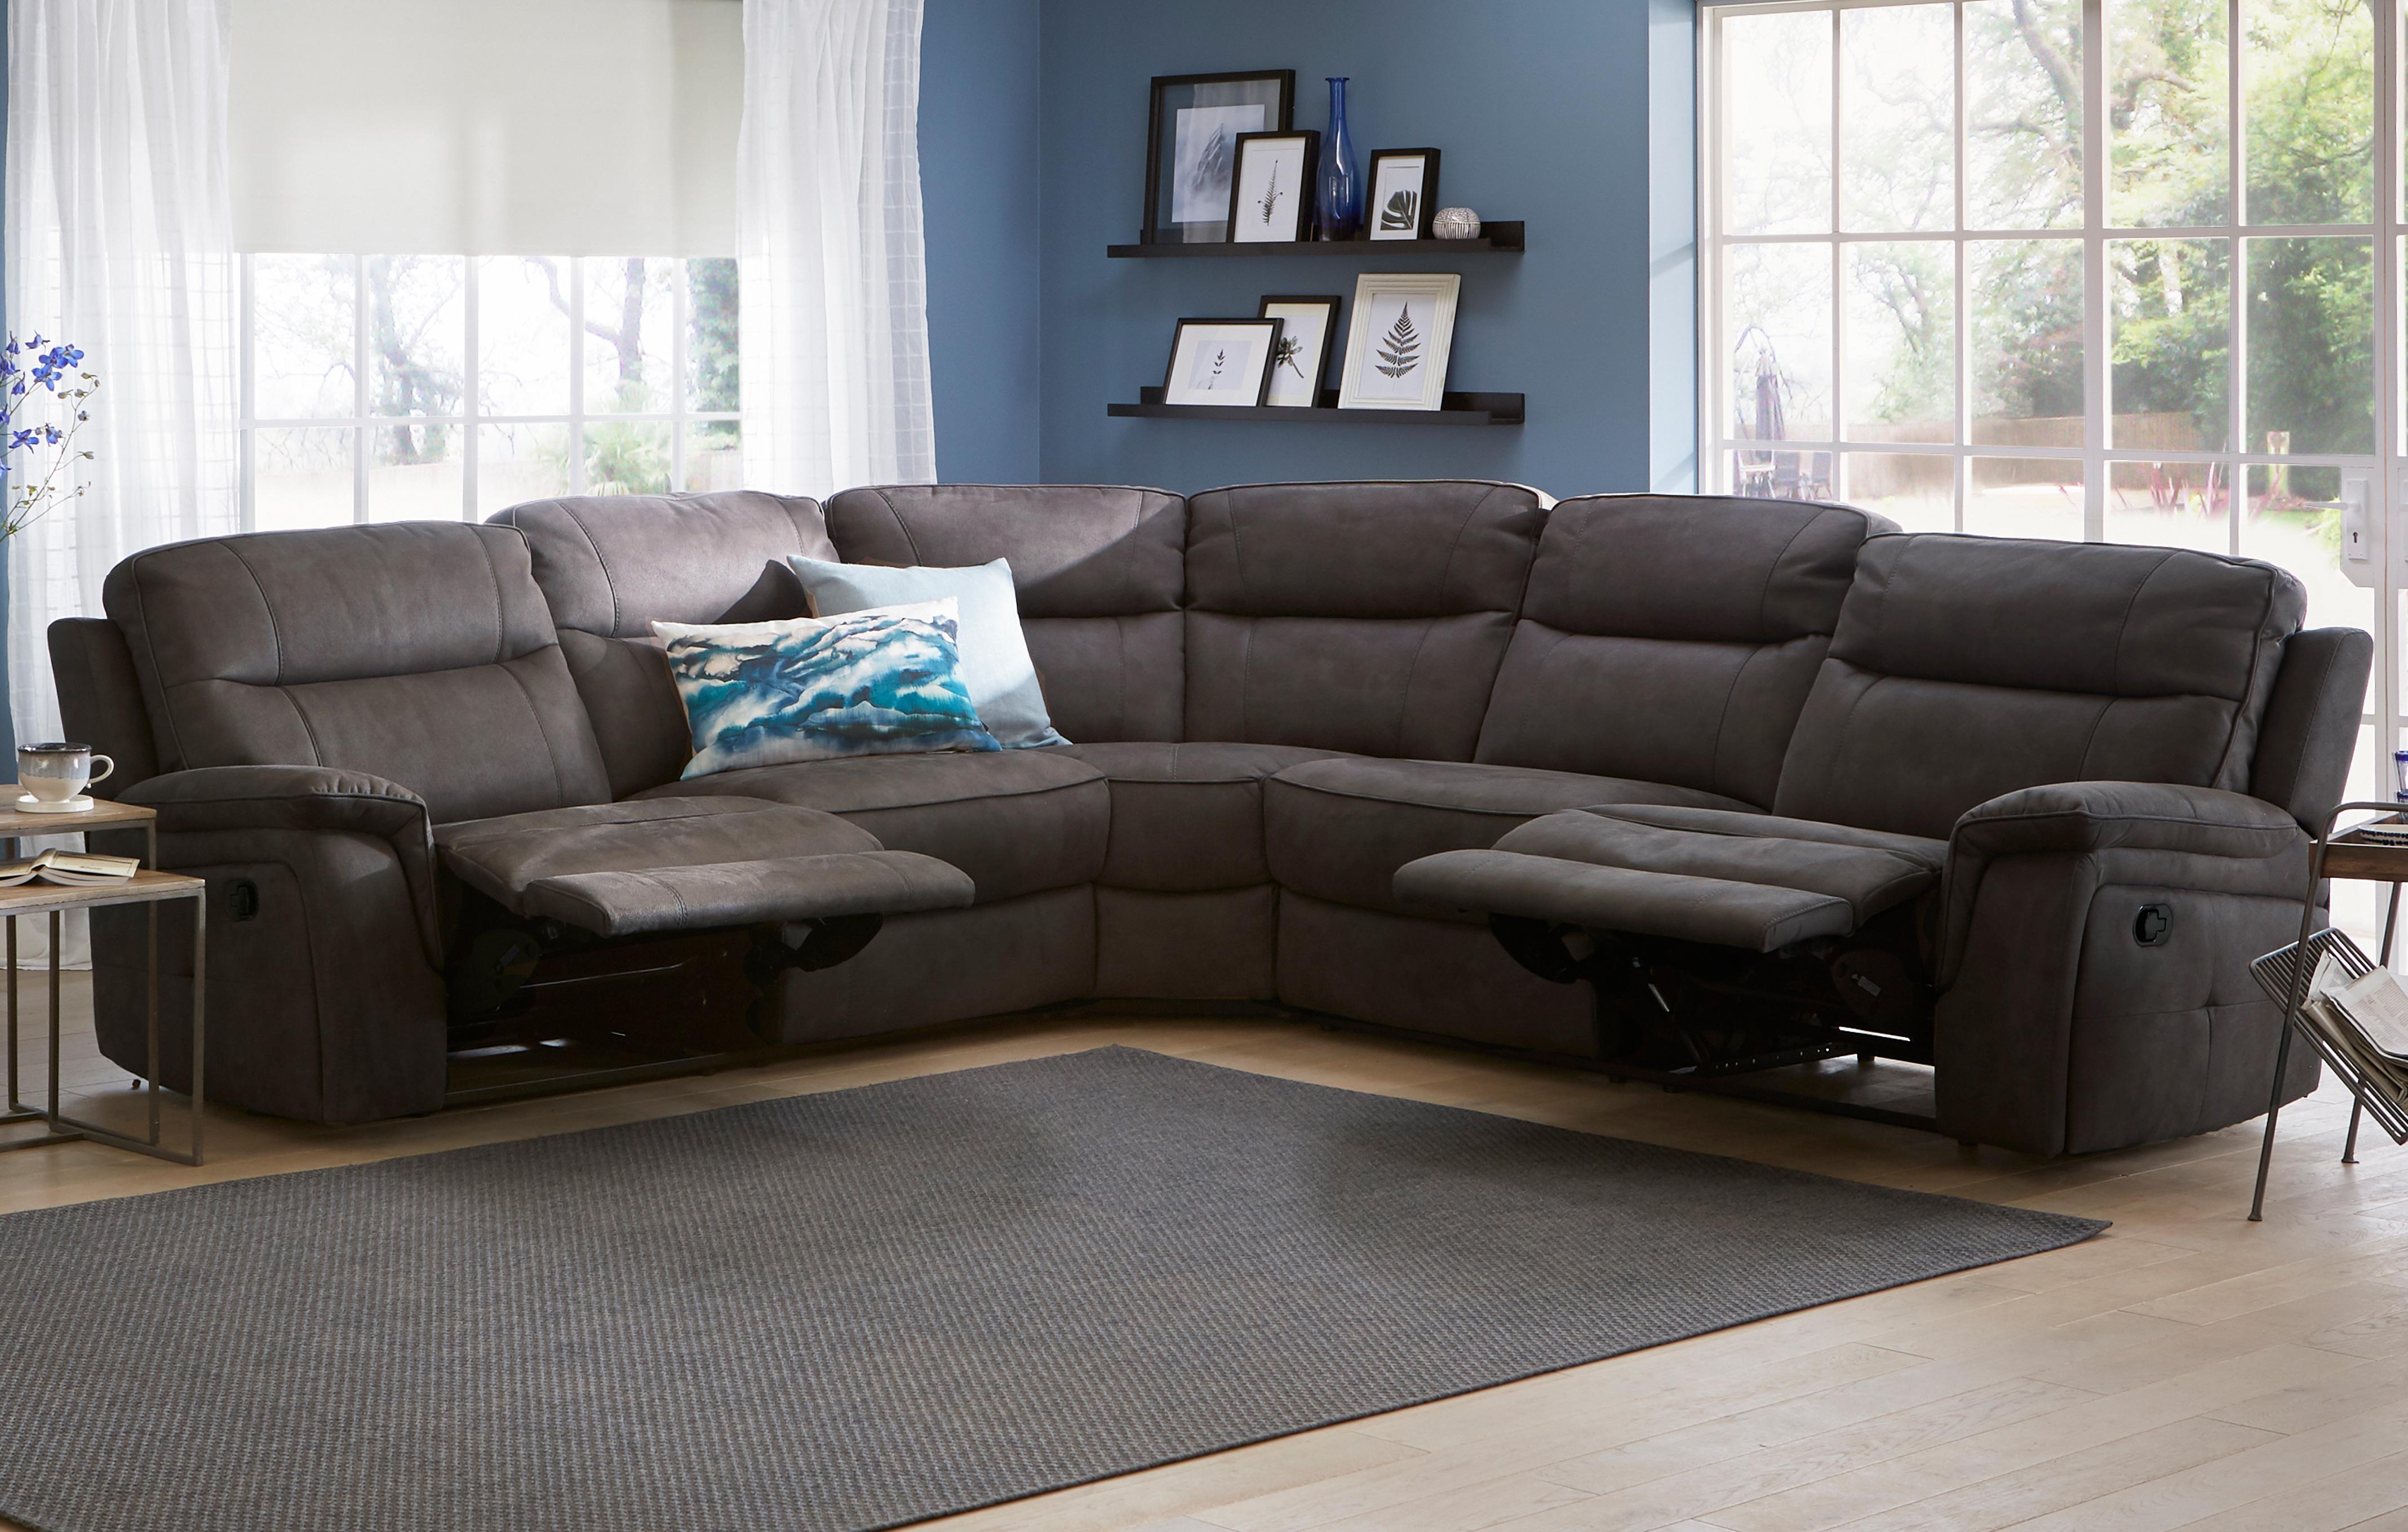 dfs metro sofa review comfortable sectional sofas chaise offers save at great savings tritan option b 2 corner manual recliner arizona